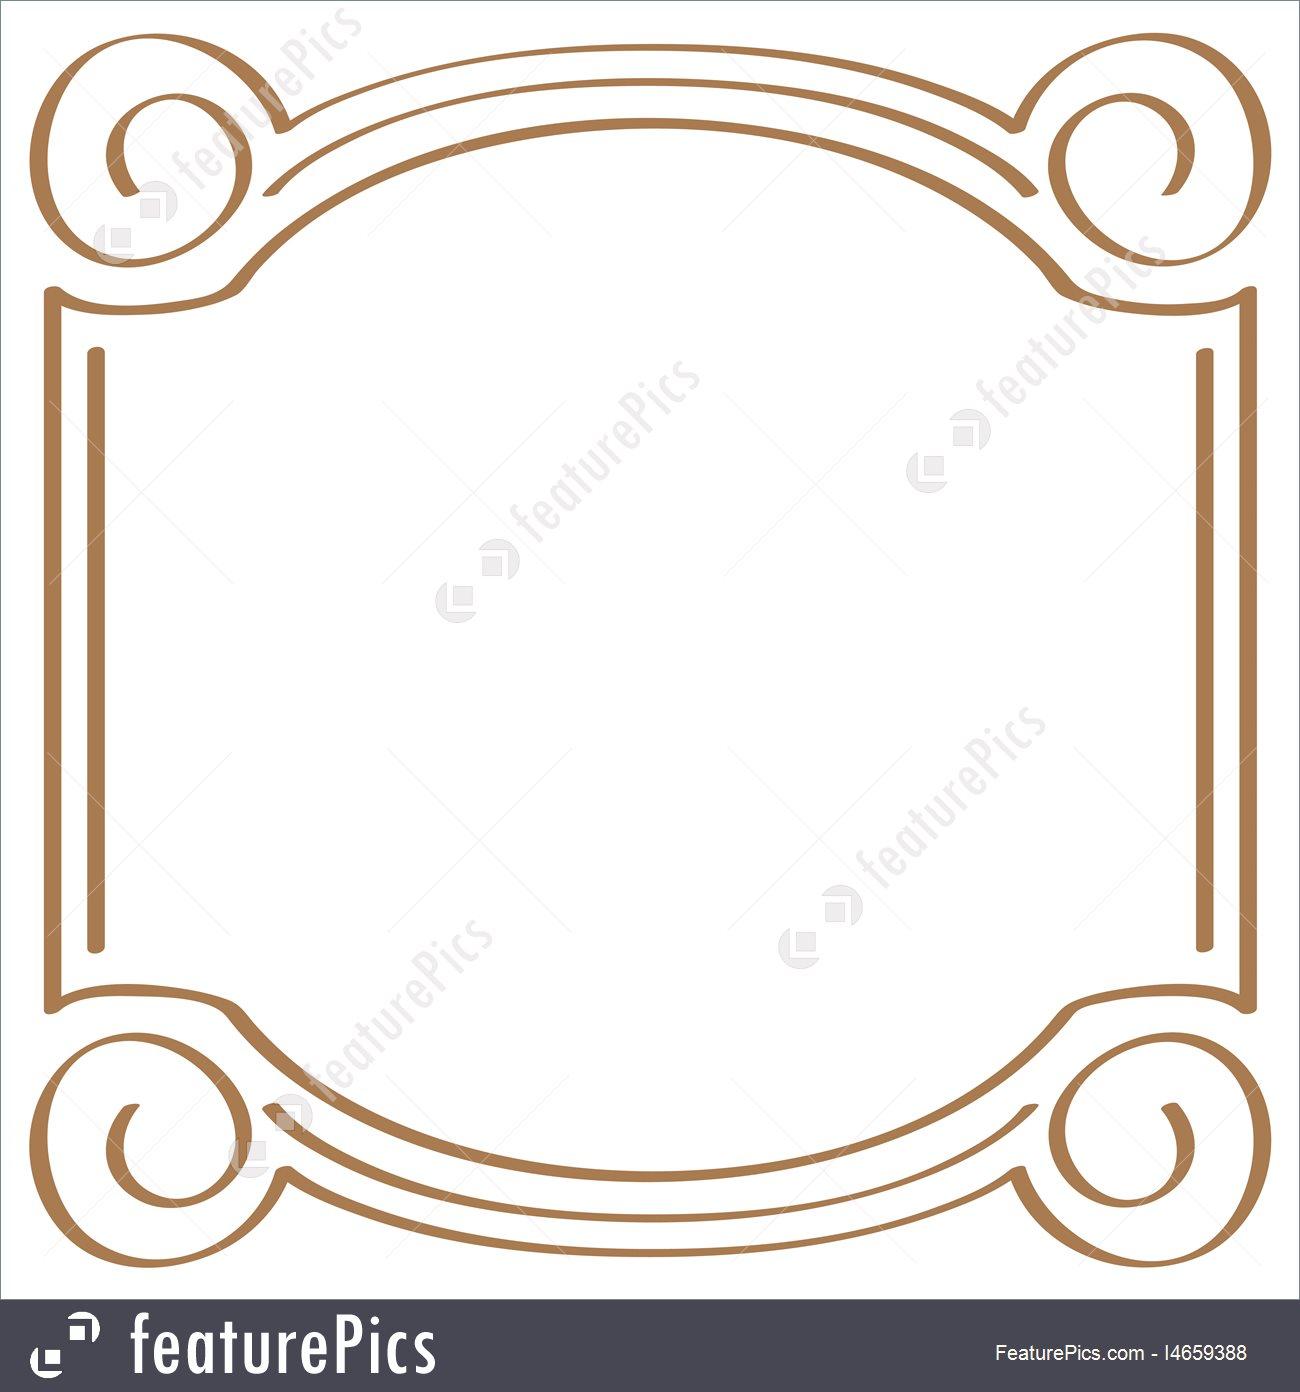 1300x1392 Vector Square Simple Frame For Design Stock Illustration I4659388